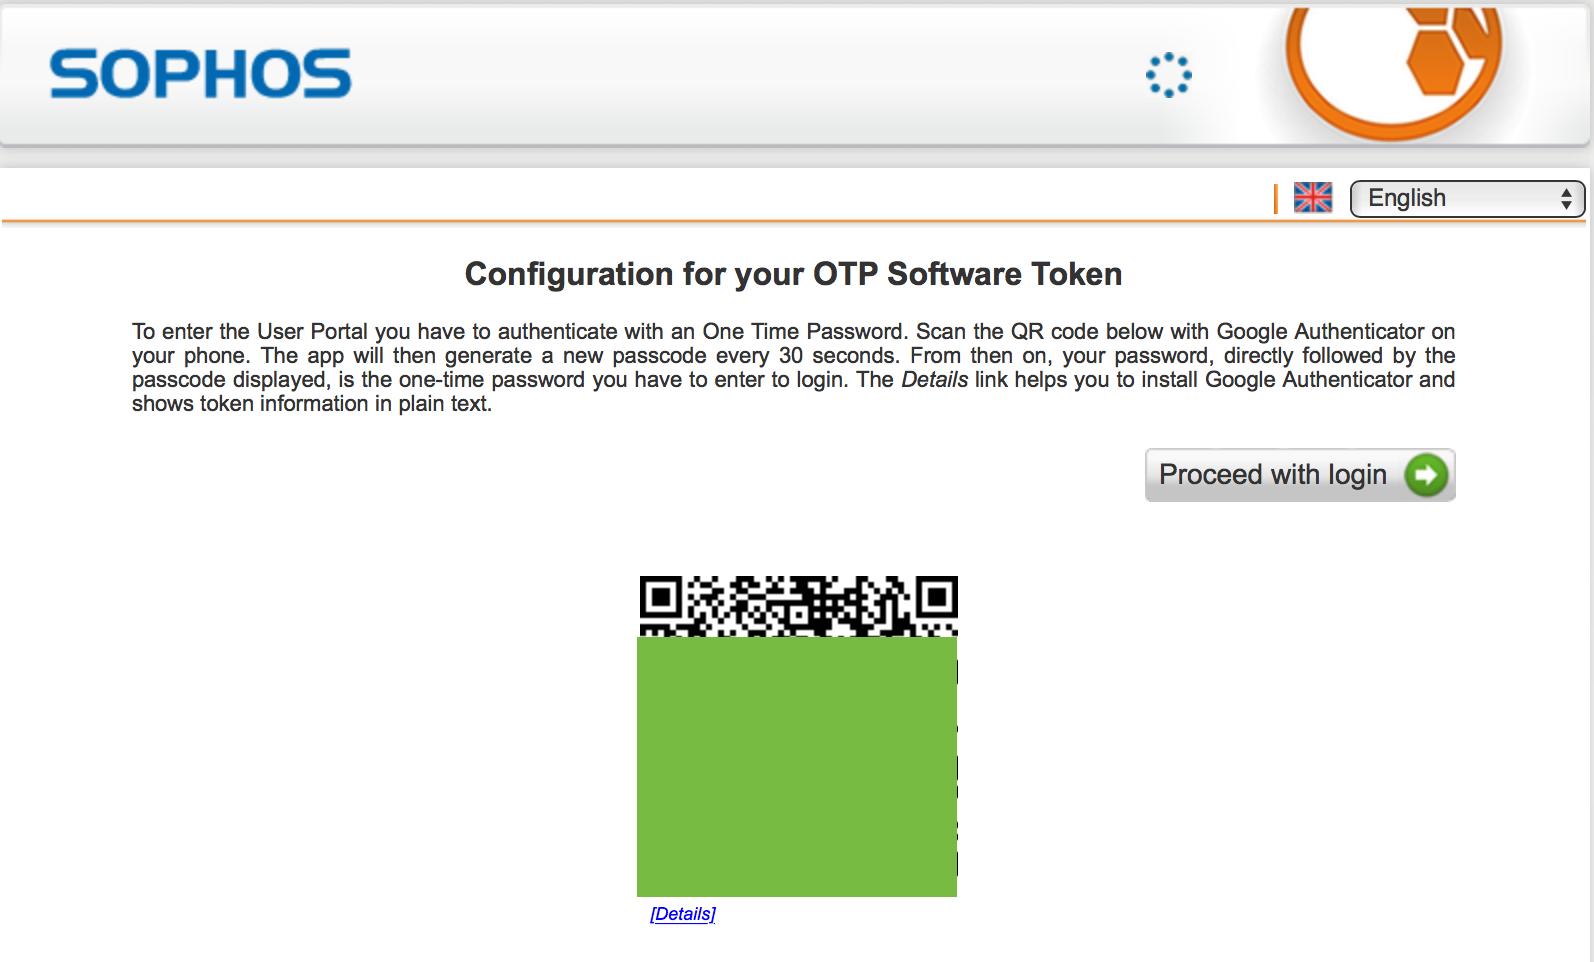 Avfs: An On-Access Anti-Virus File System